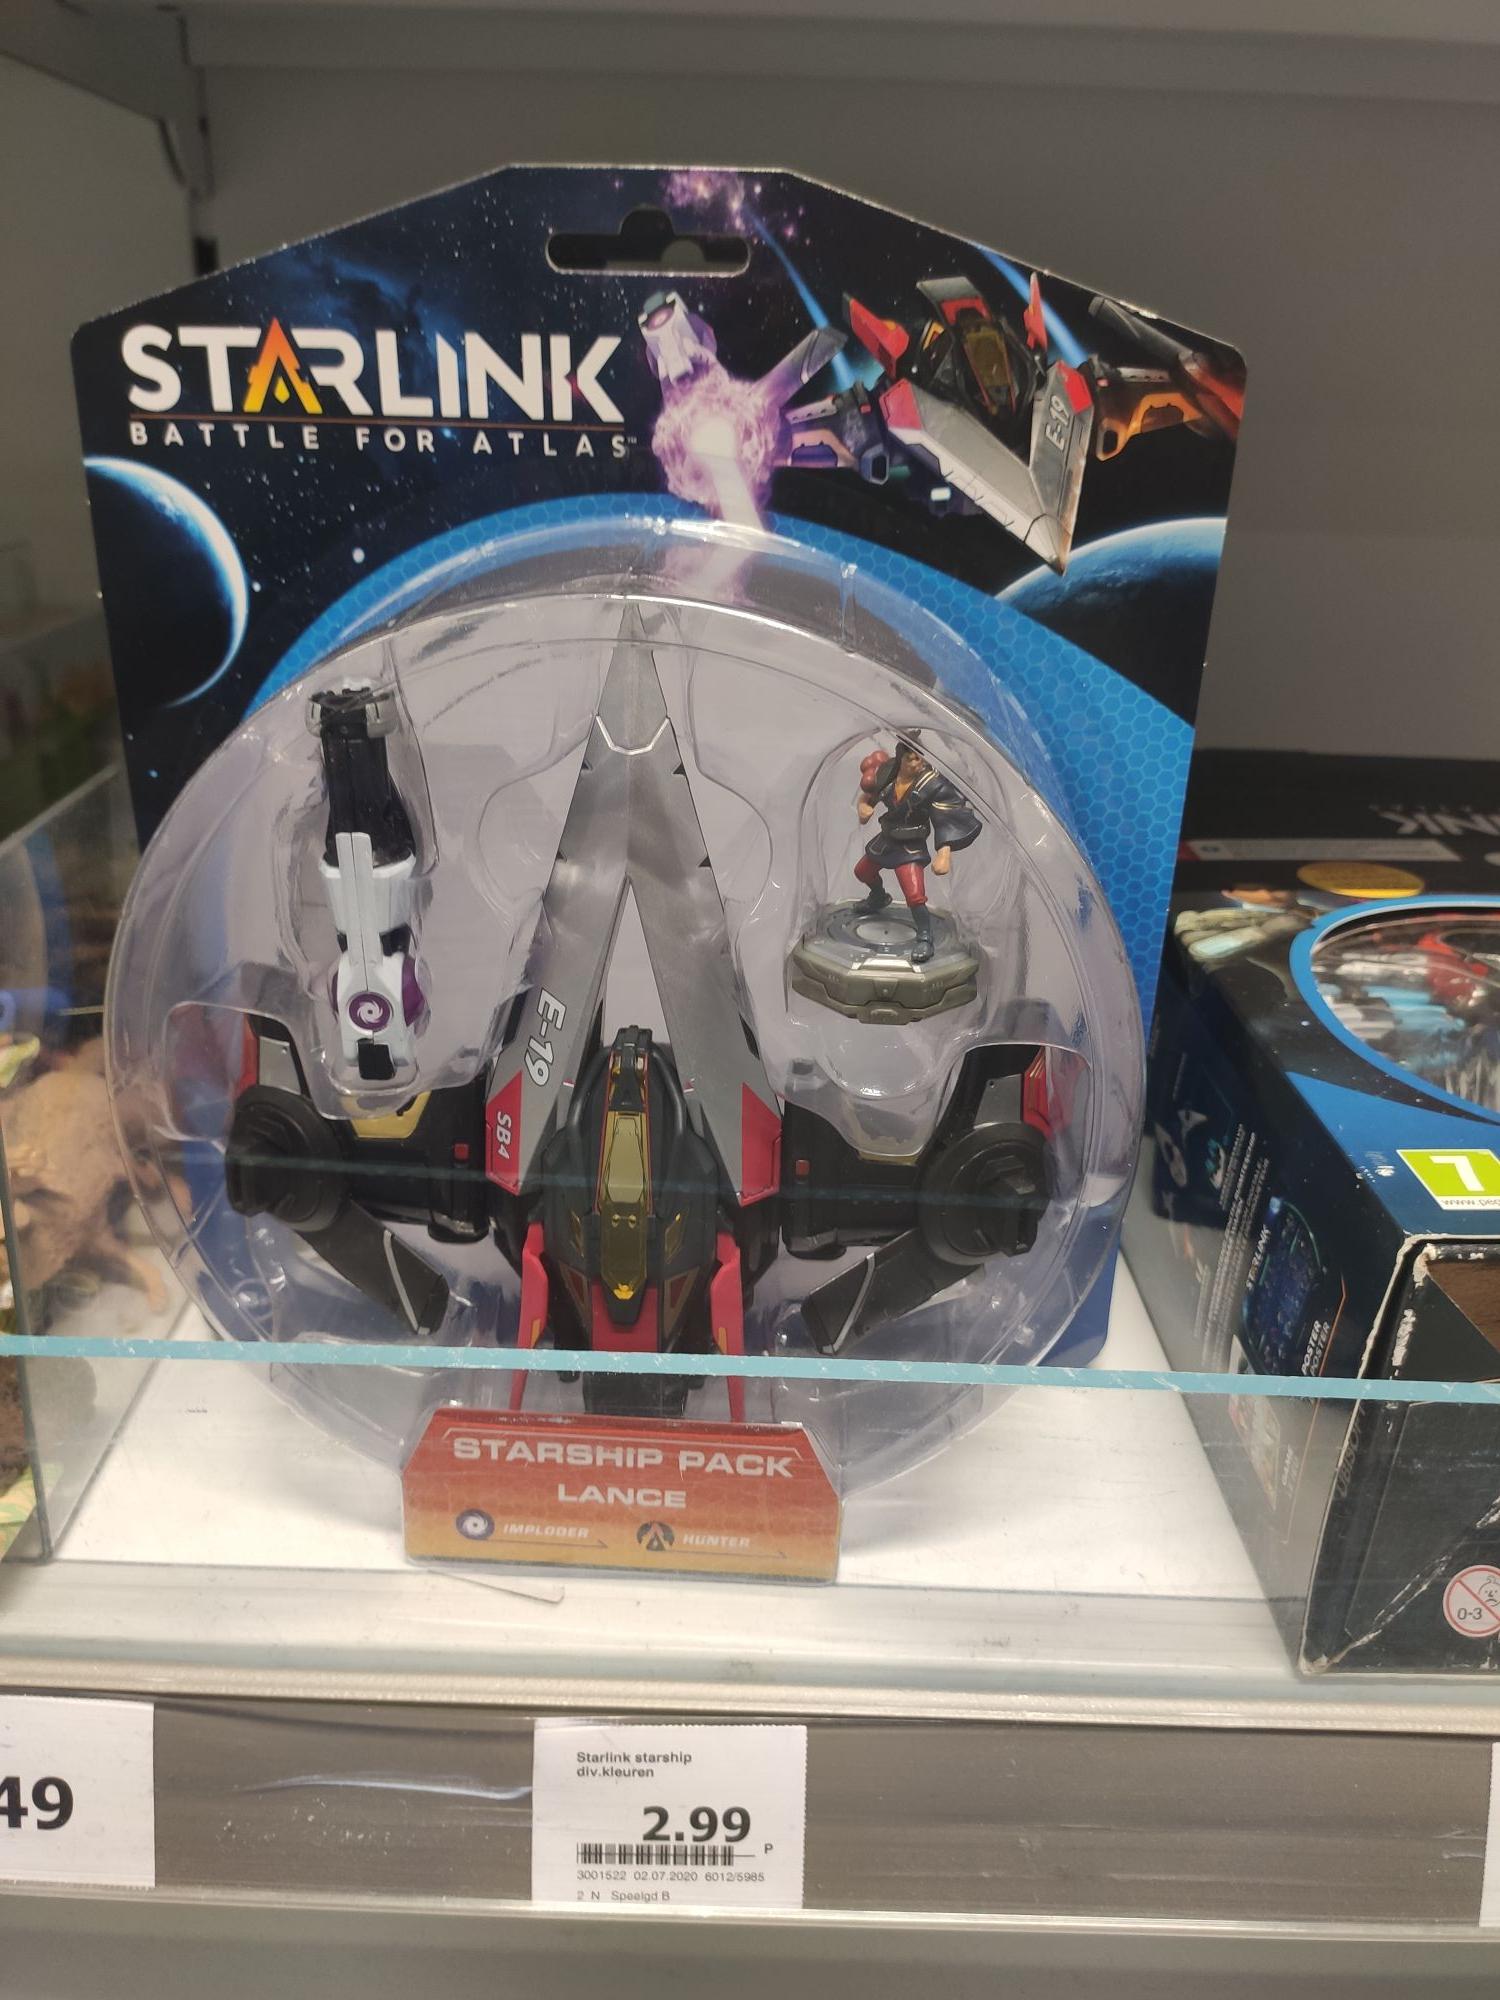 Starlink Battle pour Atlas Starship Pack Lance - Lille (59)